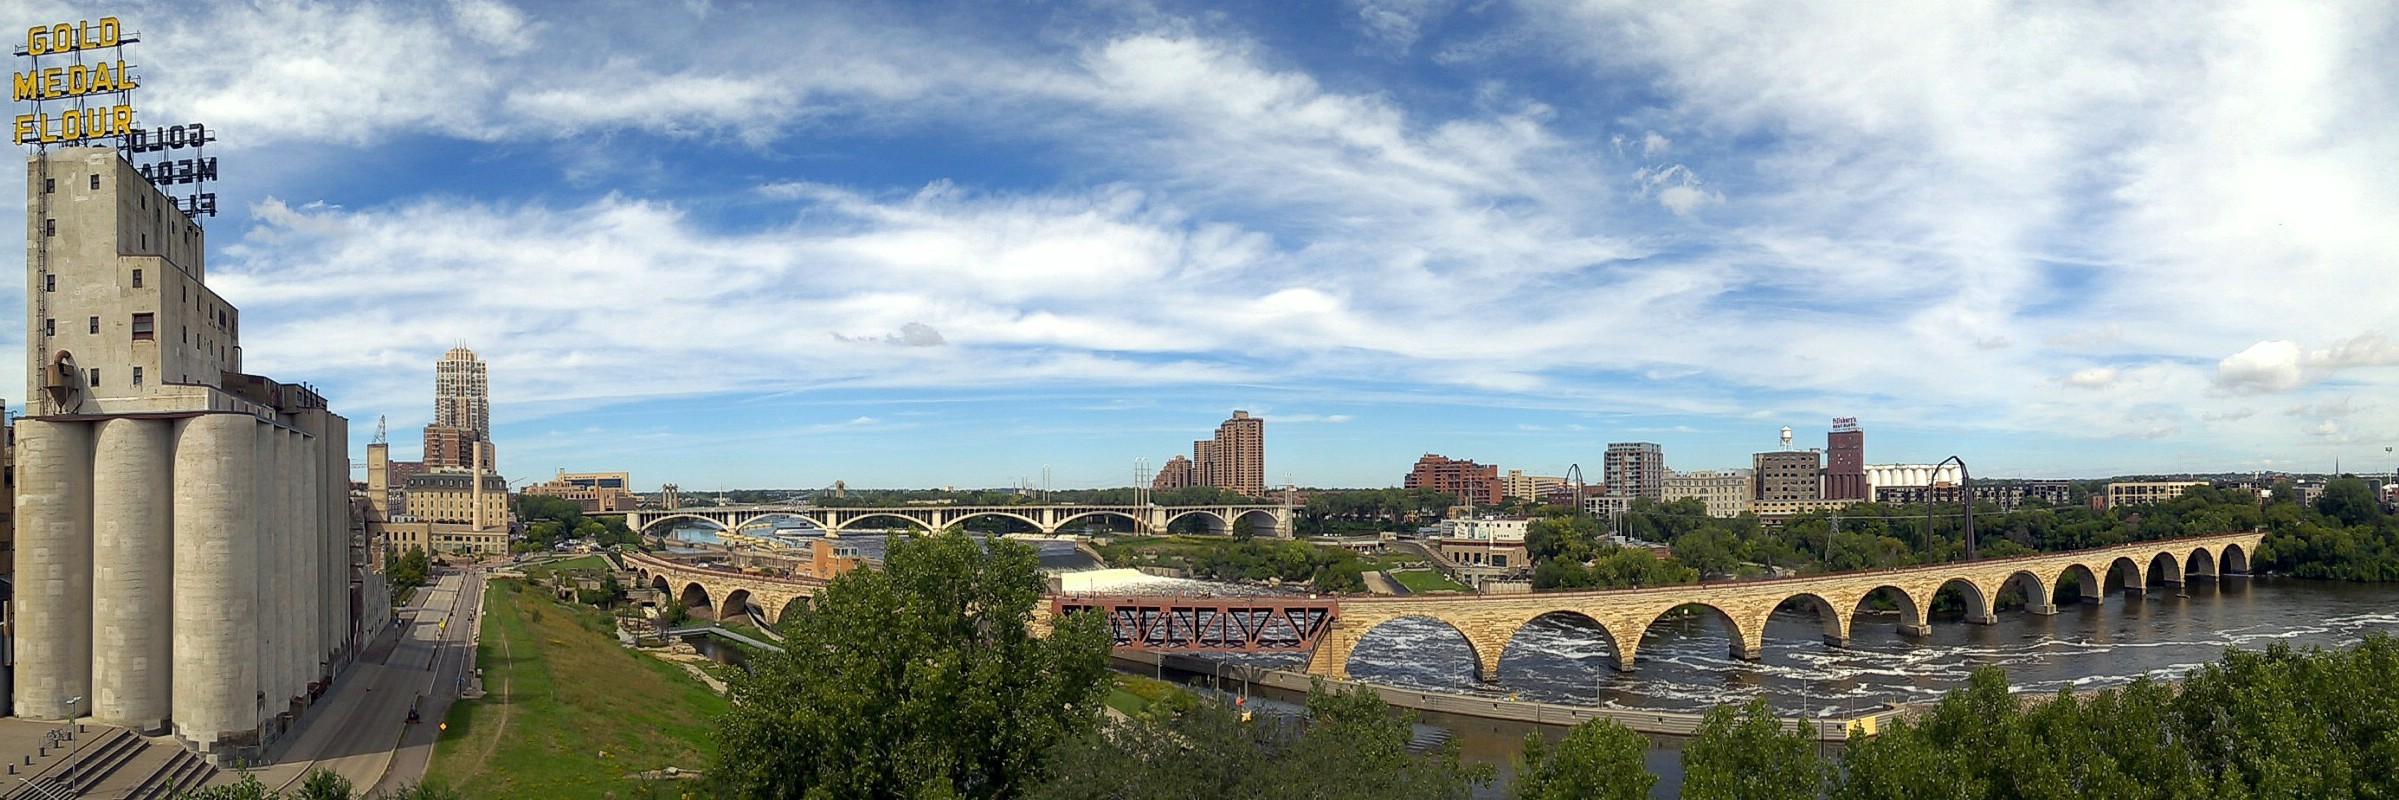 Riverfront District, Minneapolis, Minnesota, USA. August 30, 2016.